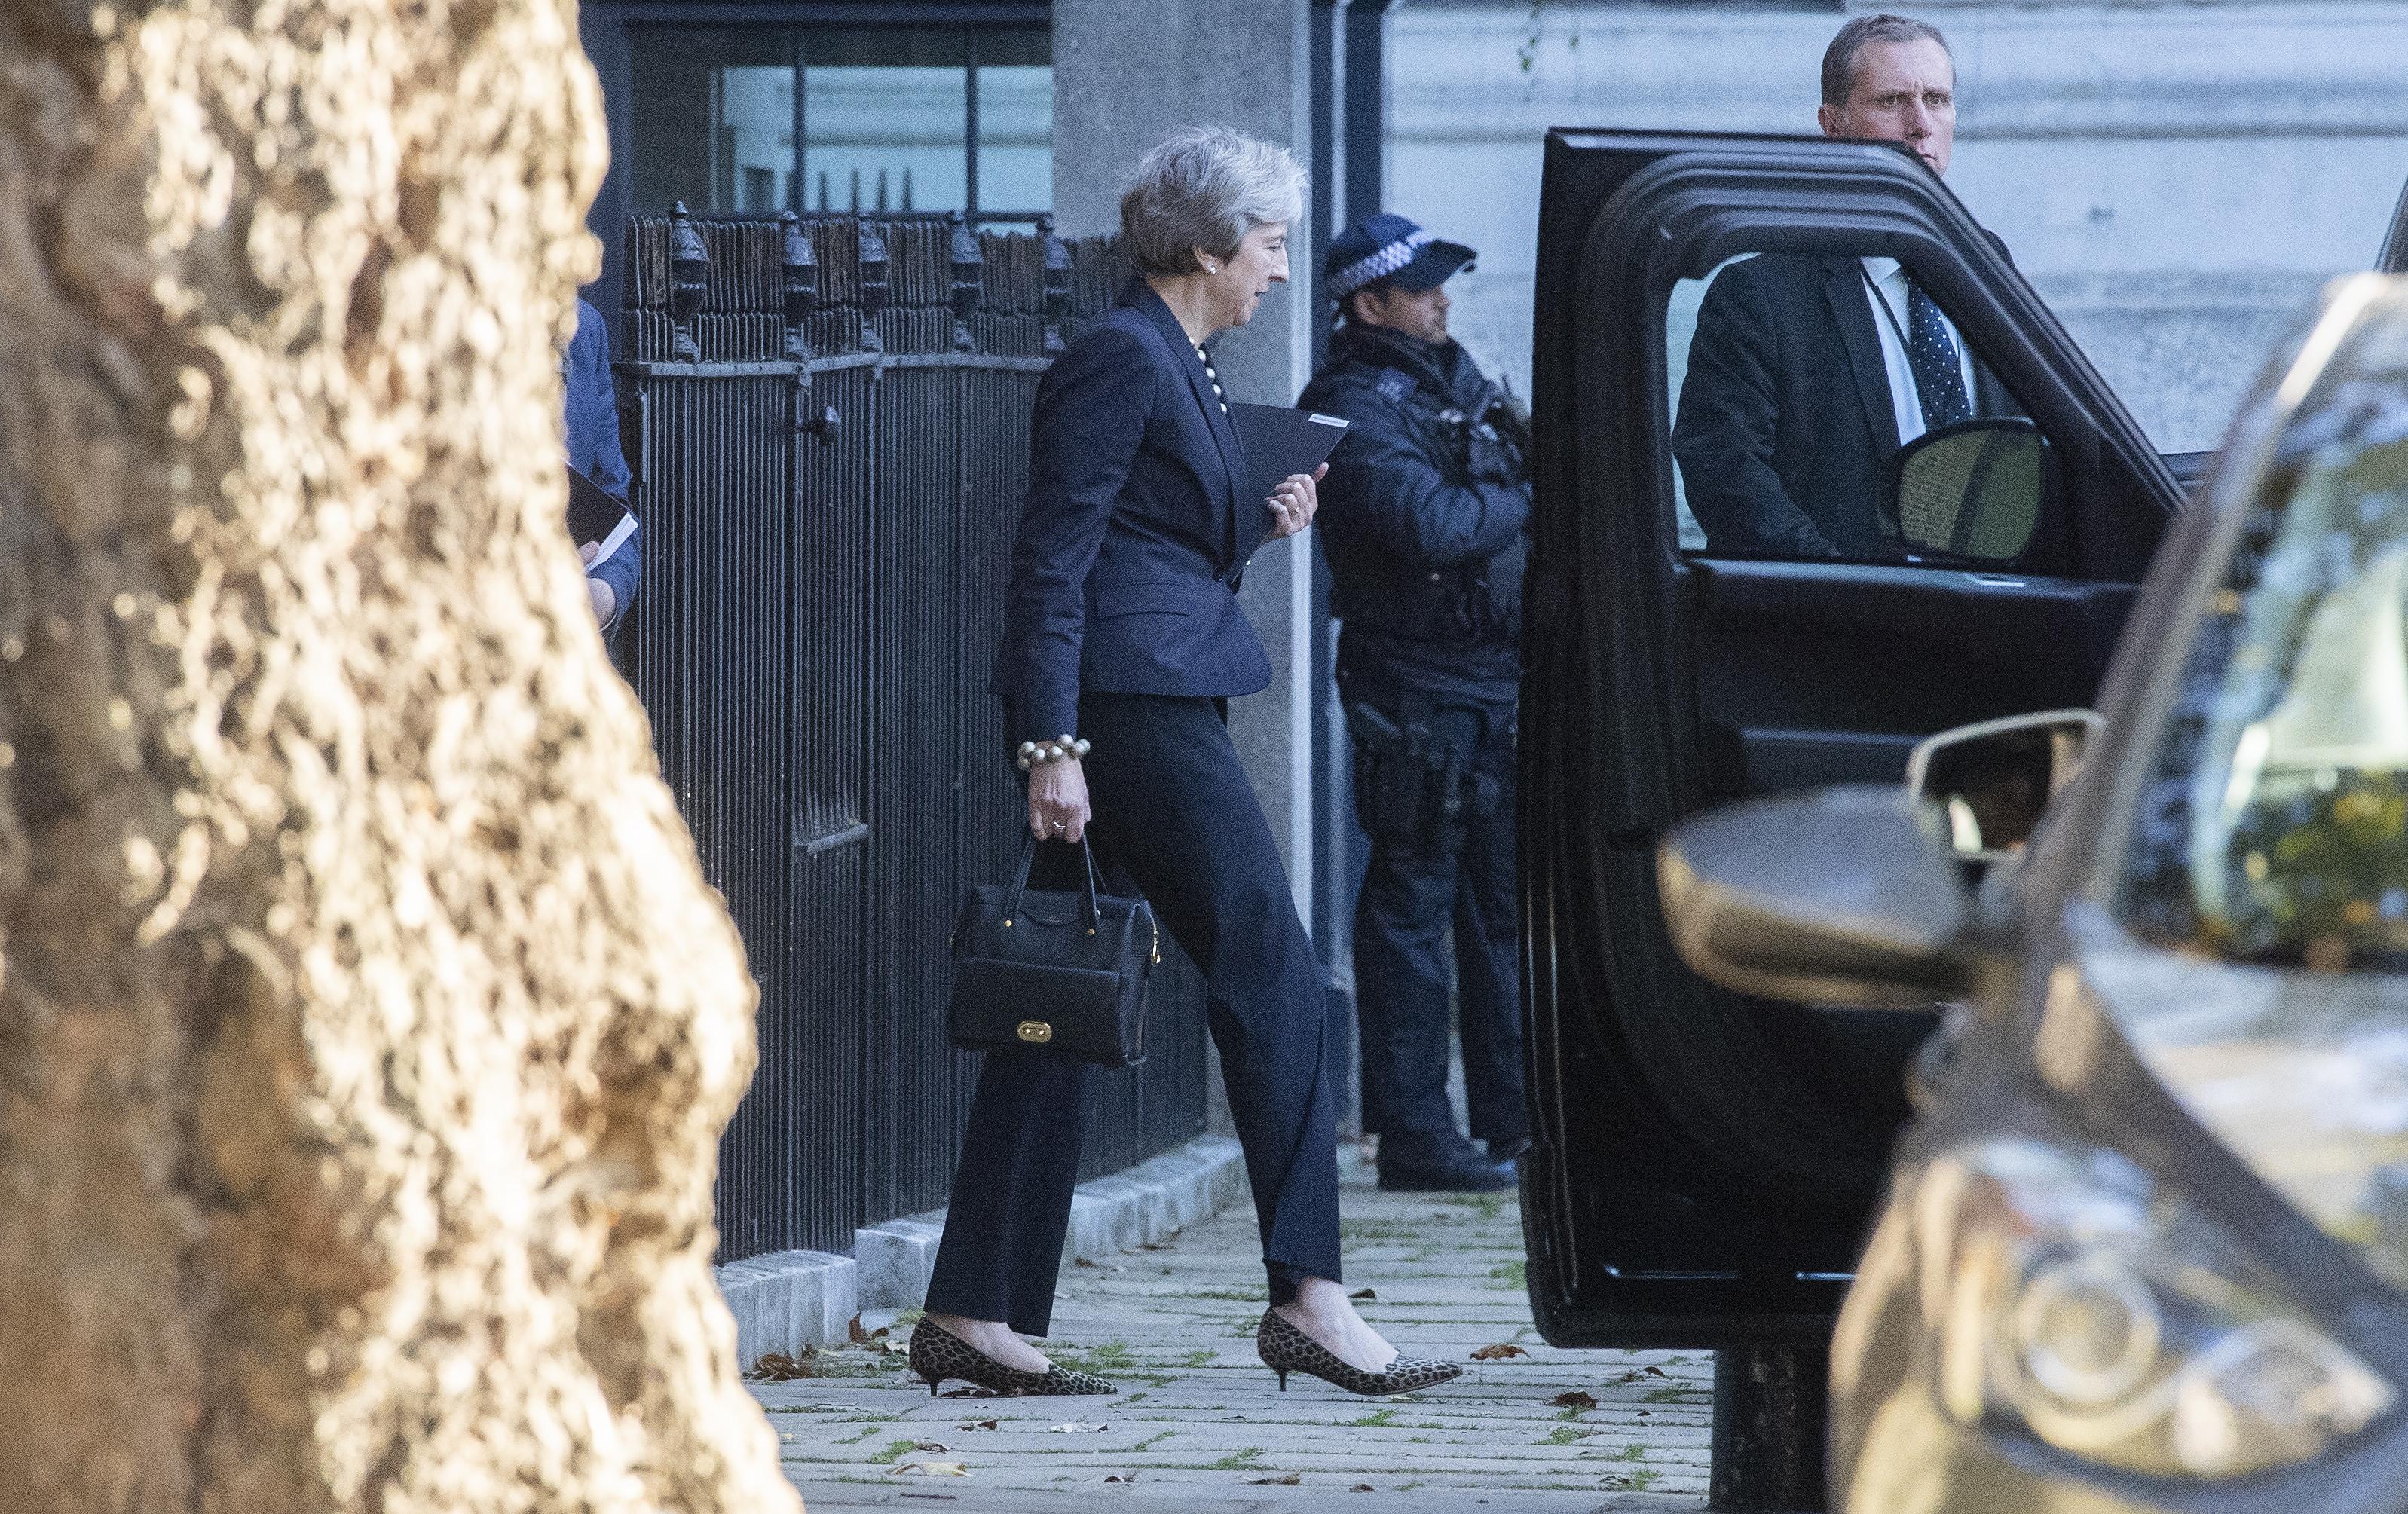 May pokušava smiriti napetosti oko Brexita